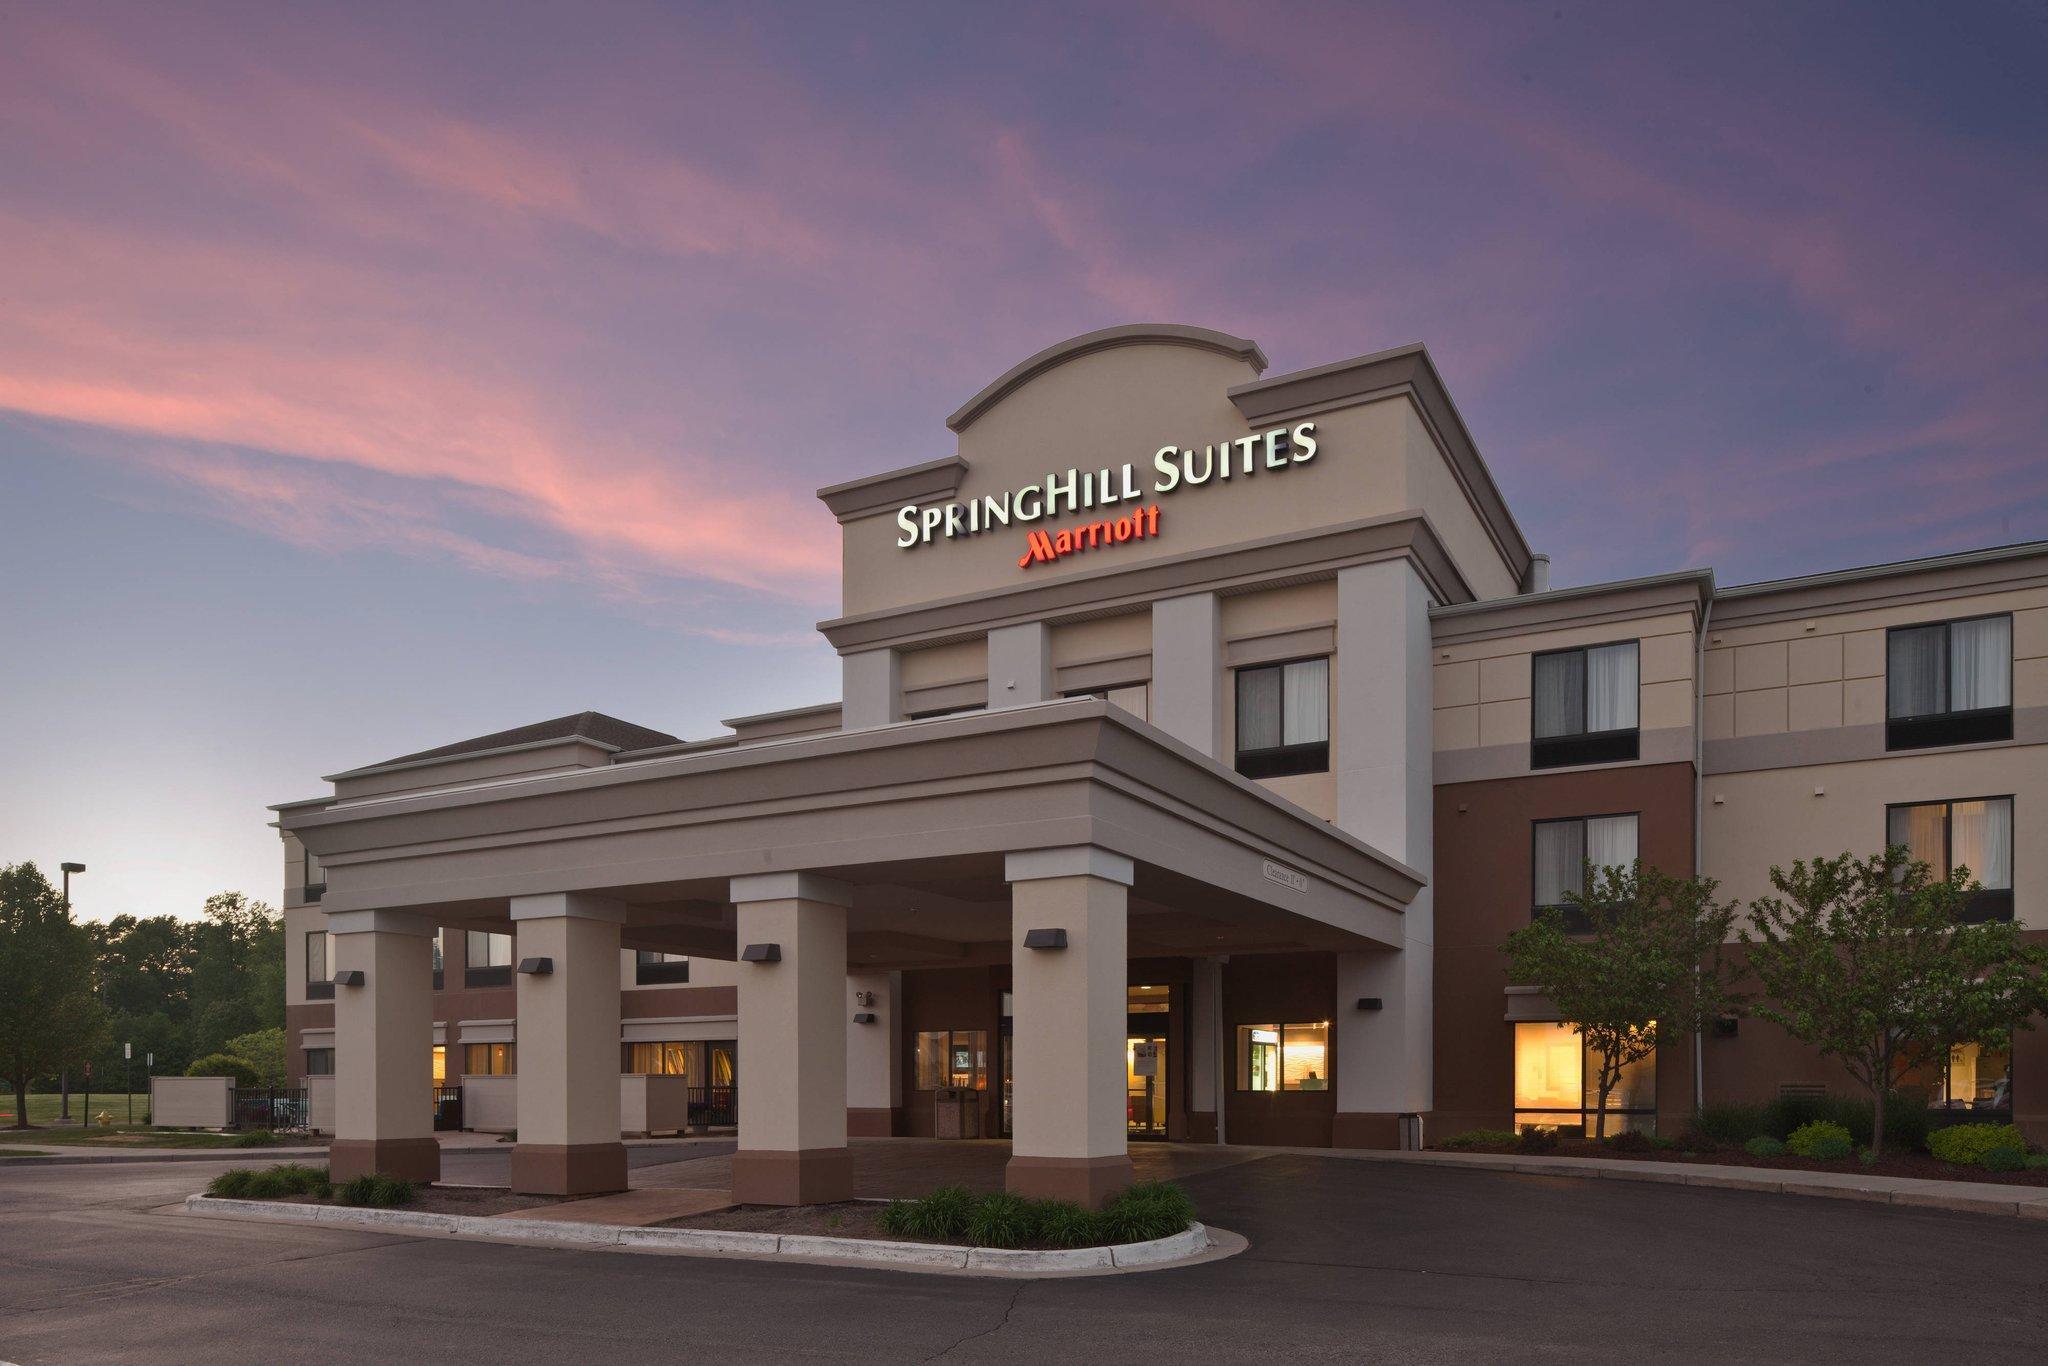 SpringHill Suites Lansing, Eaton